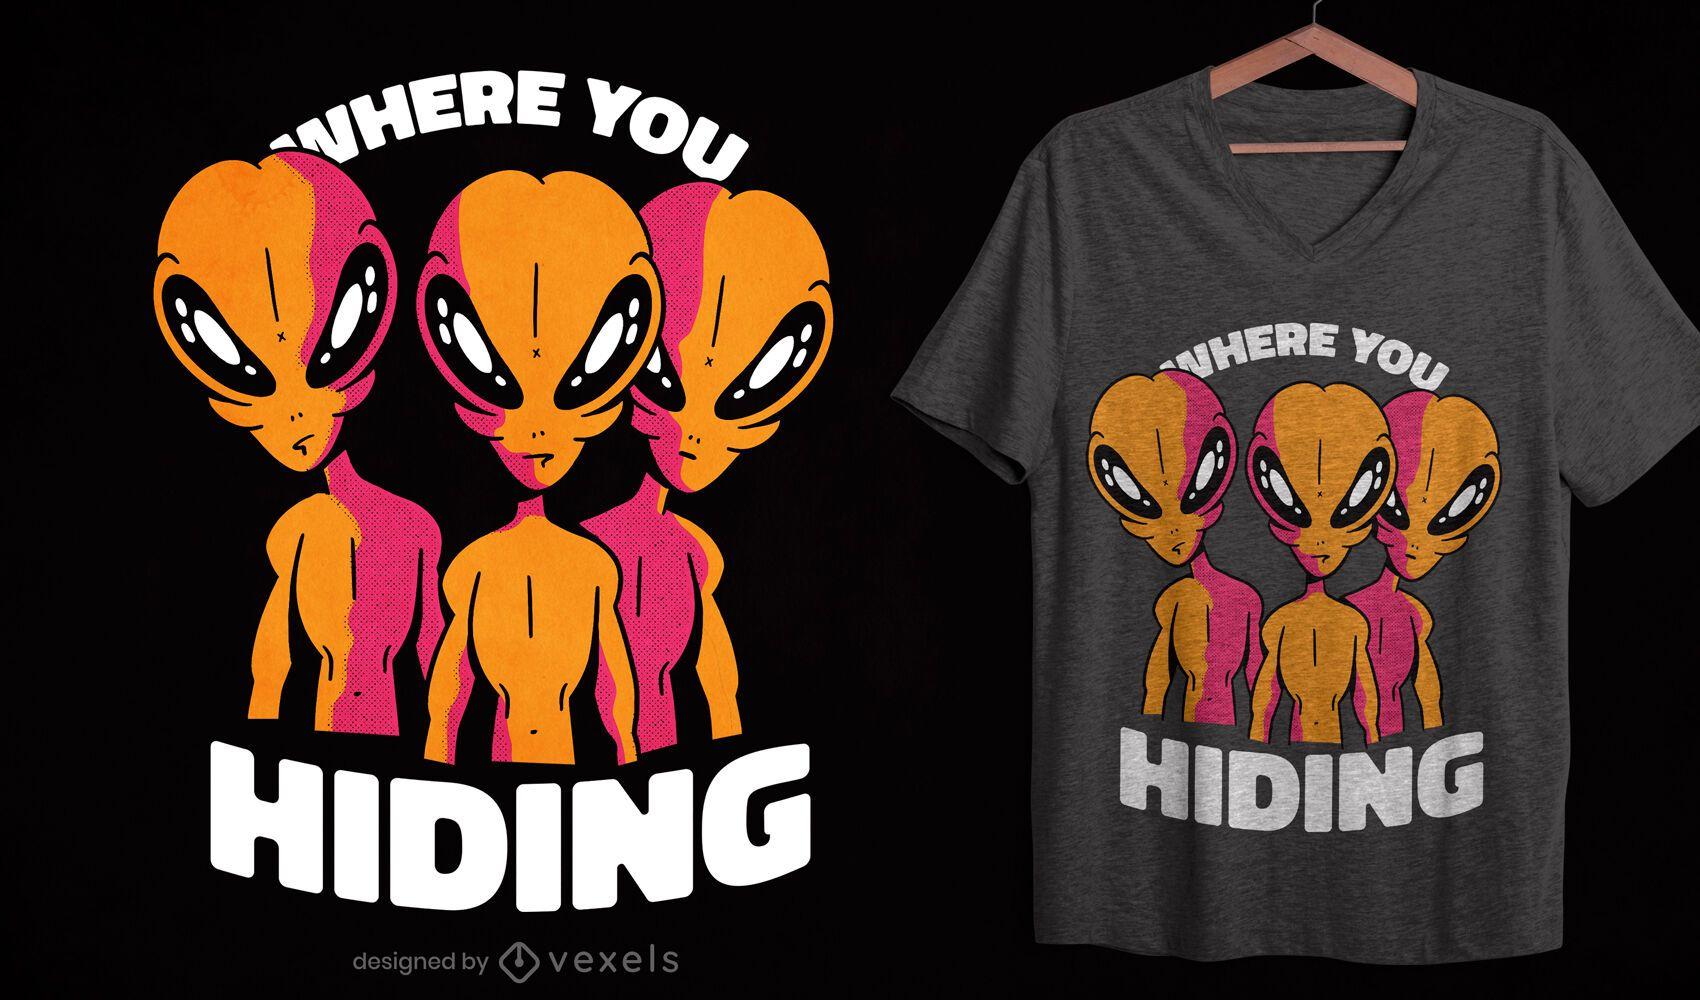 Creepy aliens t-shirt design